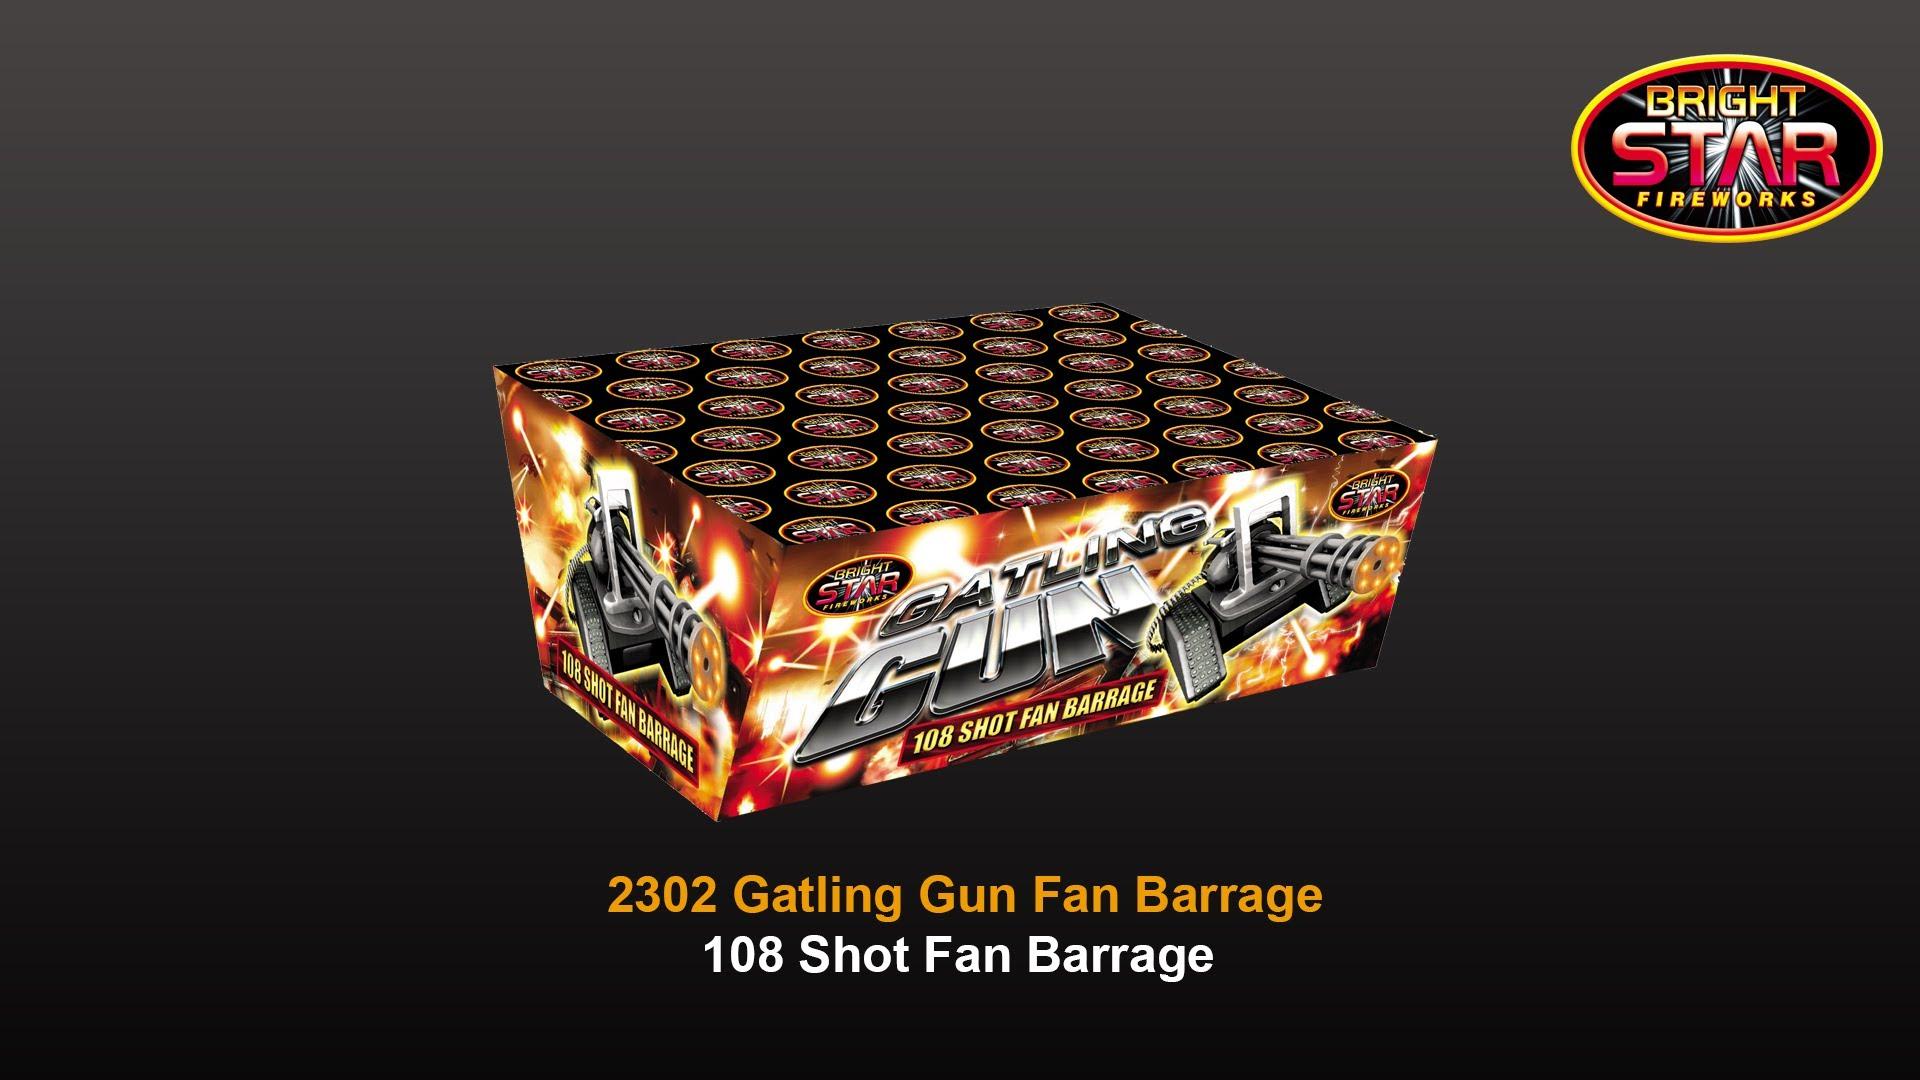 Bright Star Fireworks - 2302 Gatling Gun 108 Shot Fan Barrage - YouTube